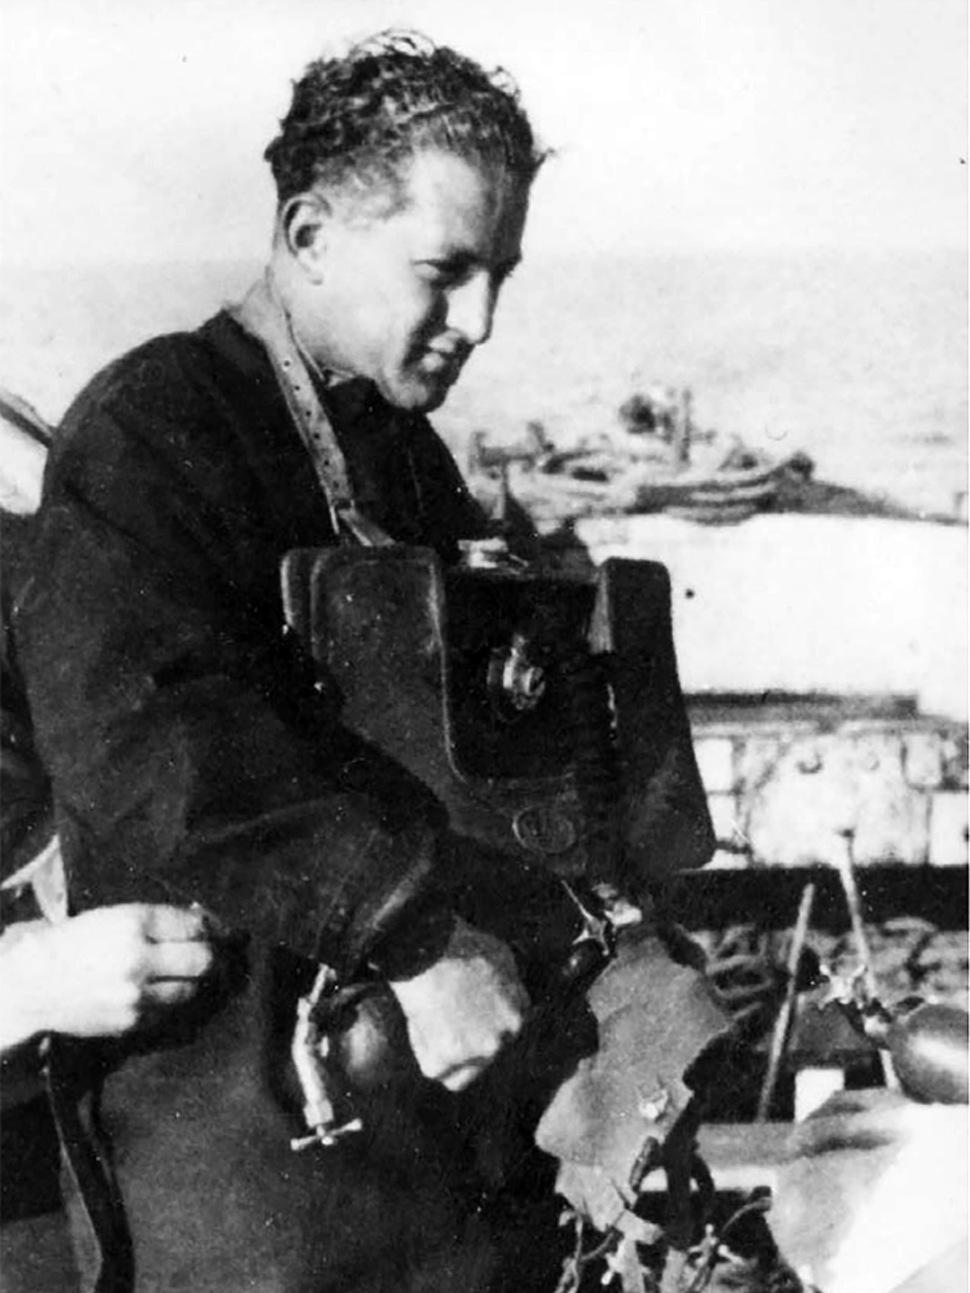 190705-luigi-durand-de-la-penne-rebreather